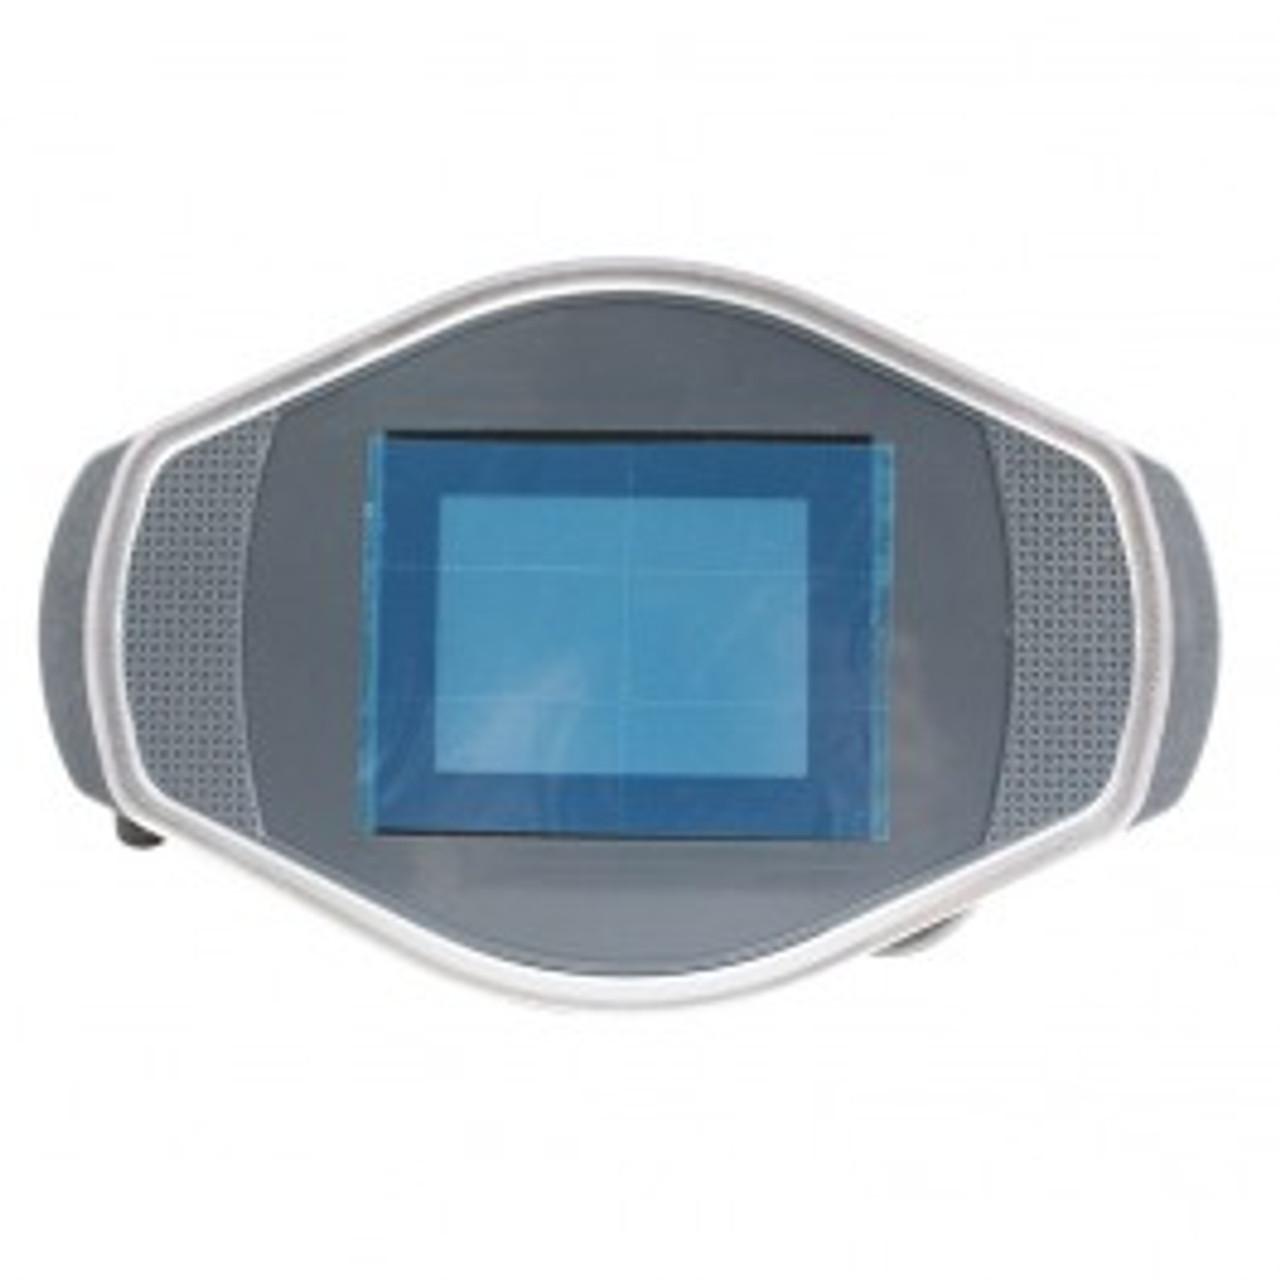 Master Spa - X310225 - Topside Control Panel - MP3 VSP